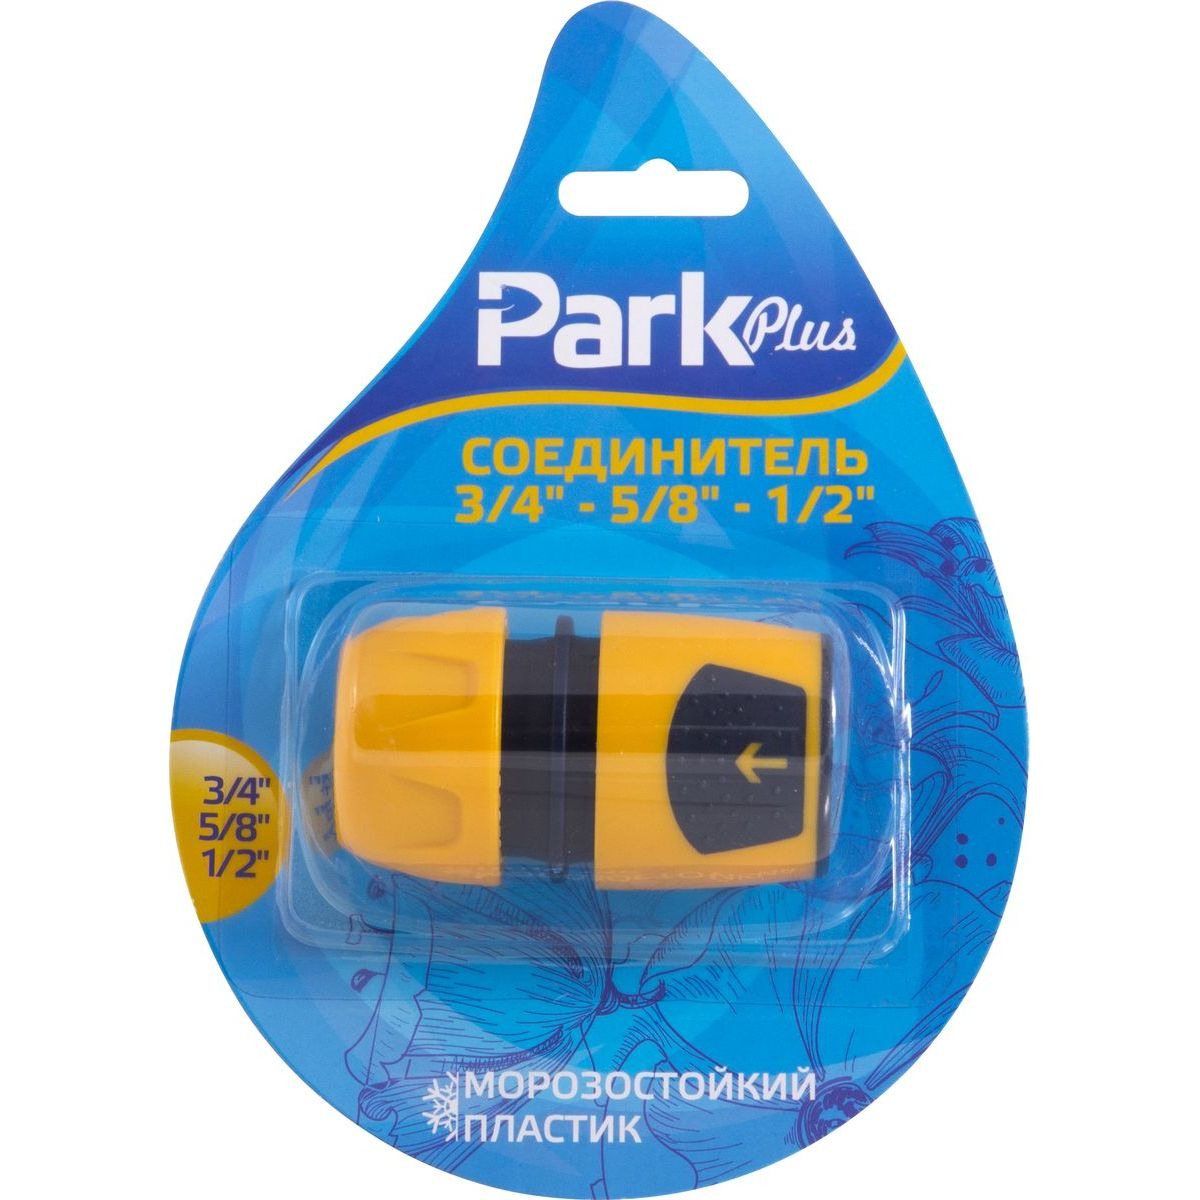 Соединитель Park 3/4-5/8-1/2, DY8010L, желтый, синий 10pcs free shipping a7800a 7800a hcpl7800a hcpl 7800 a7800 dip 8 amplifiers 4 5 5 5 sv 8 db photoelectric coupler new original